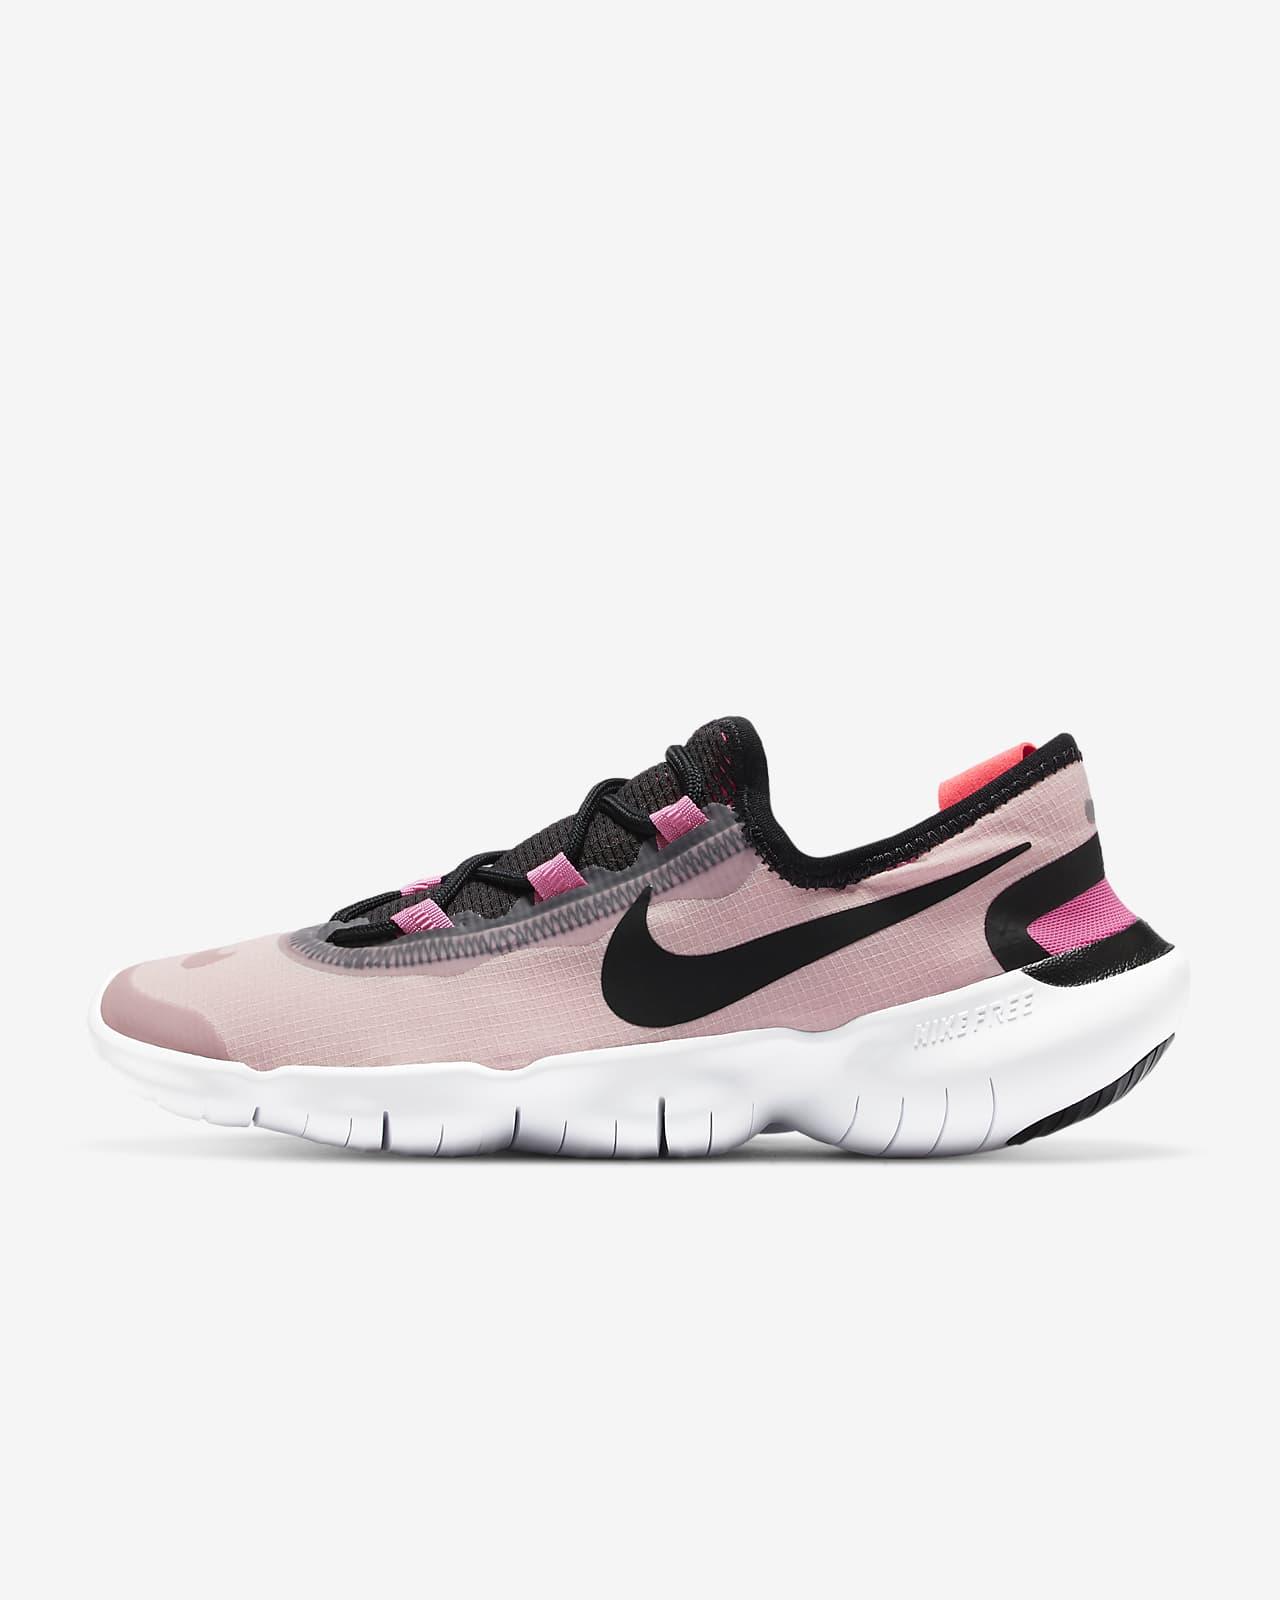 Nike Free RN 5.0 2020 女款跑鞋